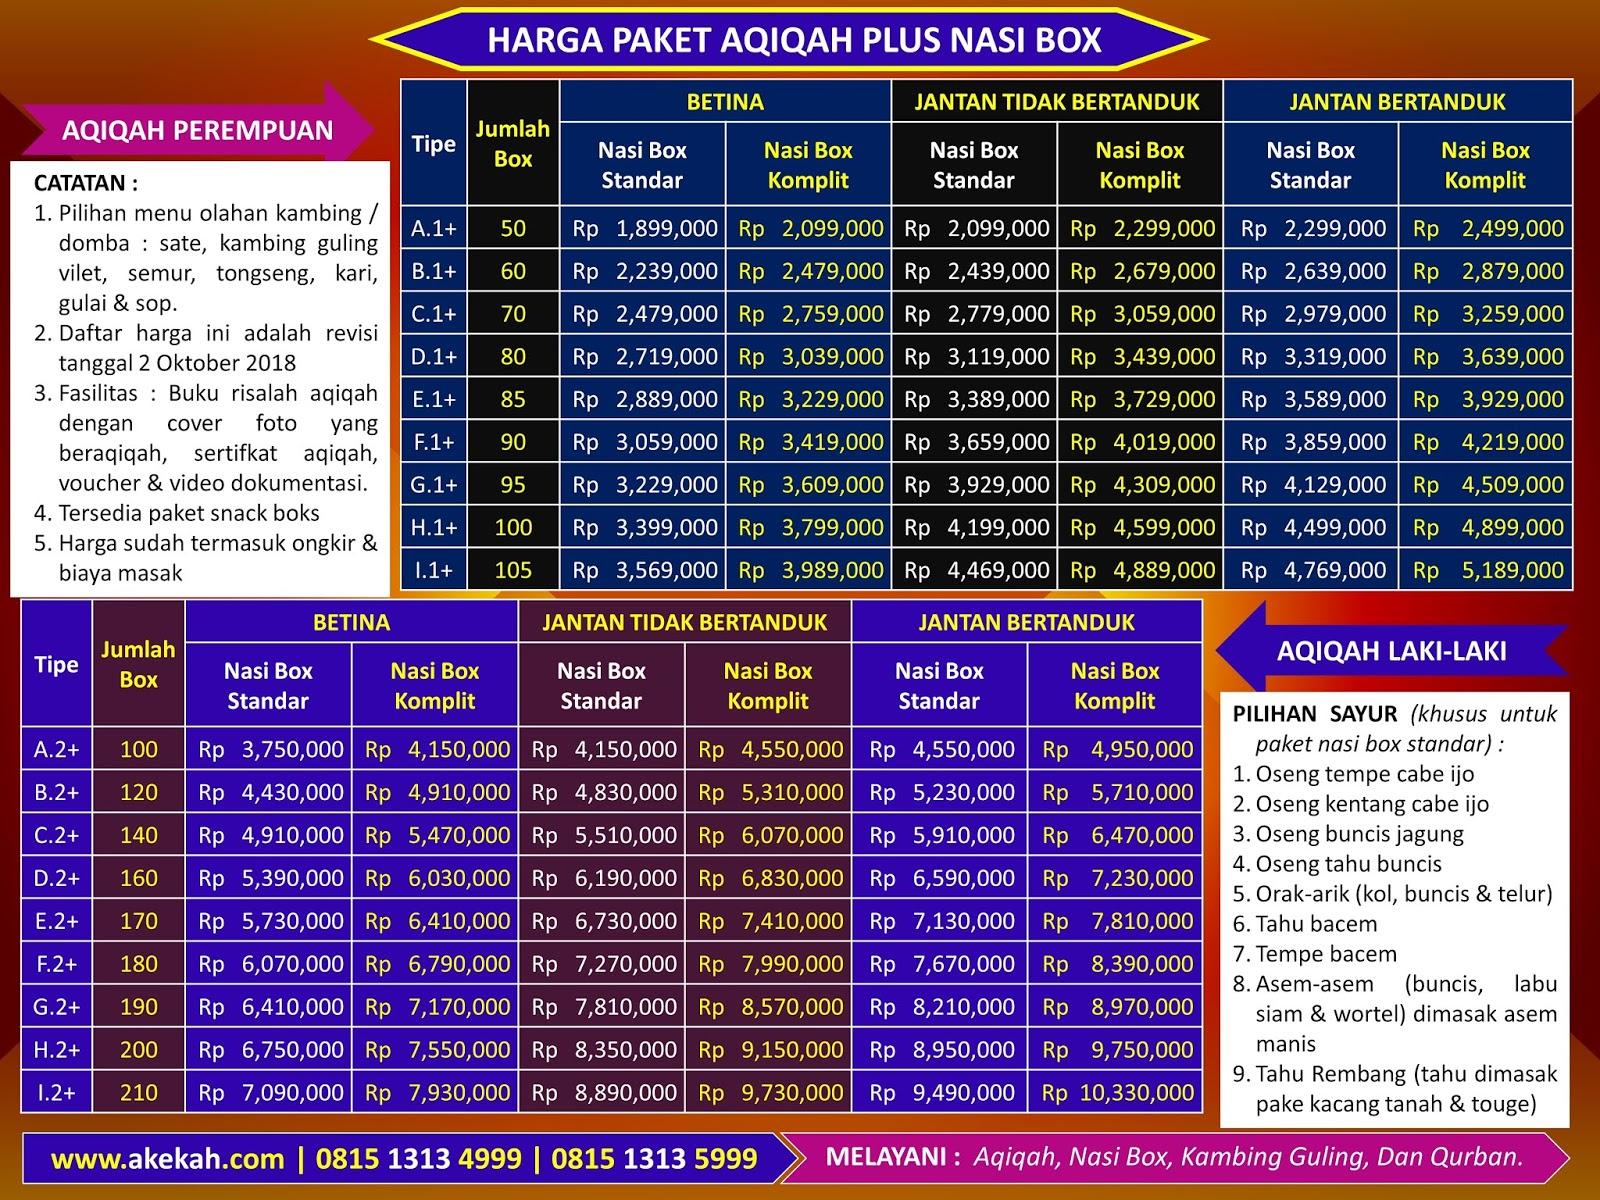 Penyedia Akikah Plus Untuk Laki-Laki Kecamatan Kemang Kabupaten Bogor Jawa Barat